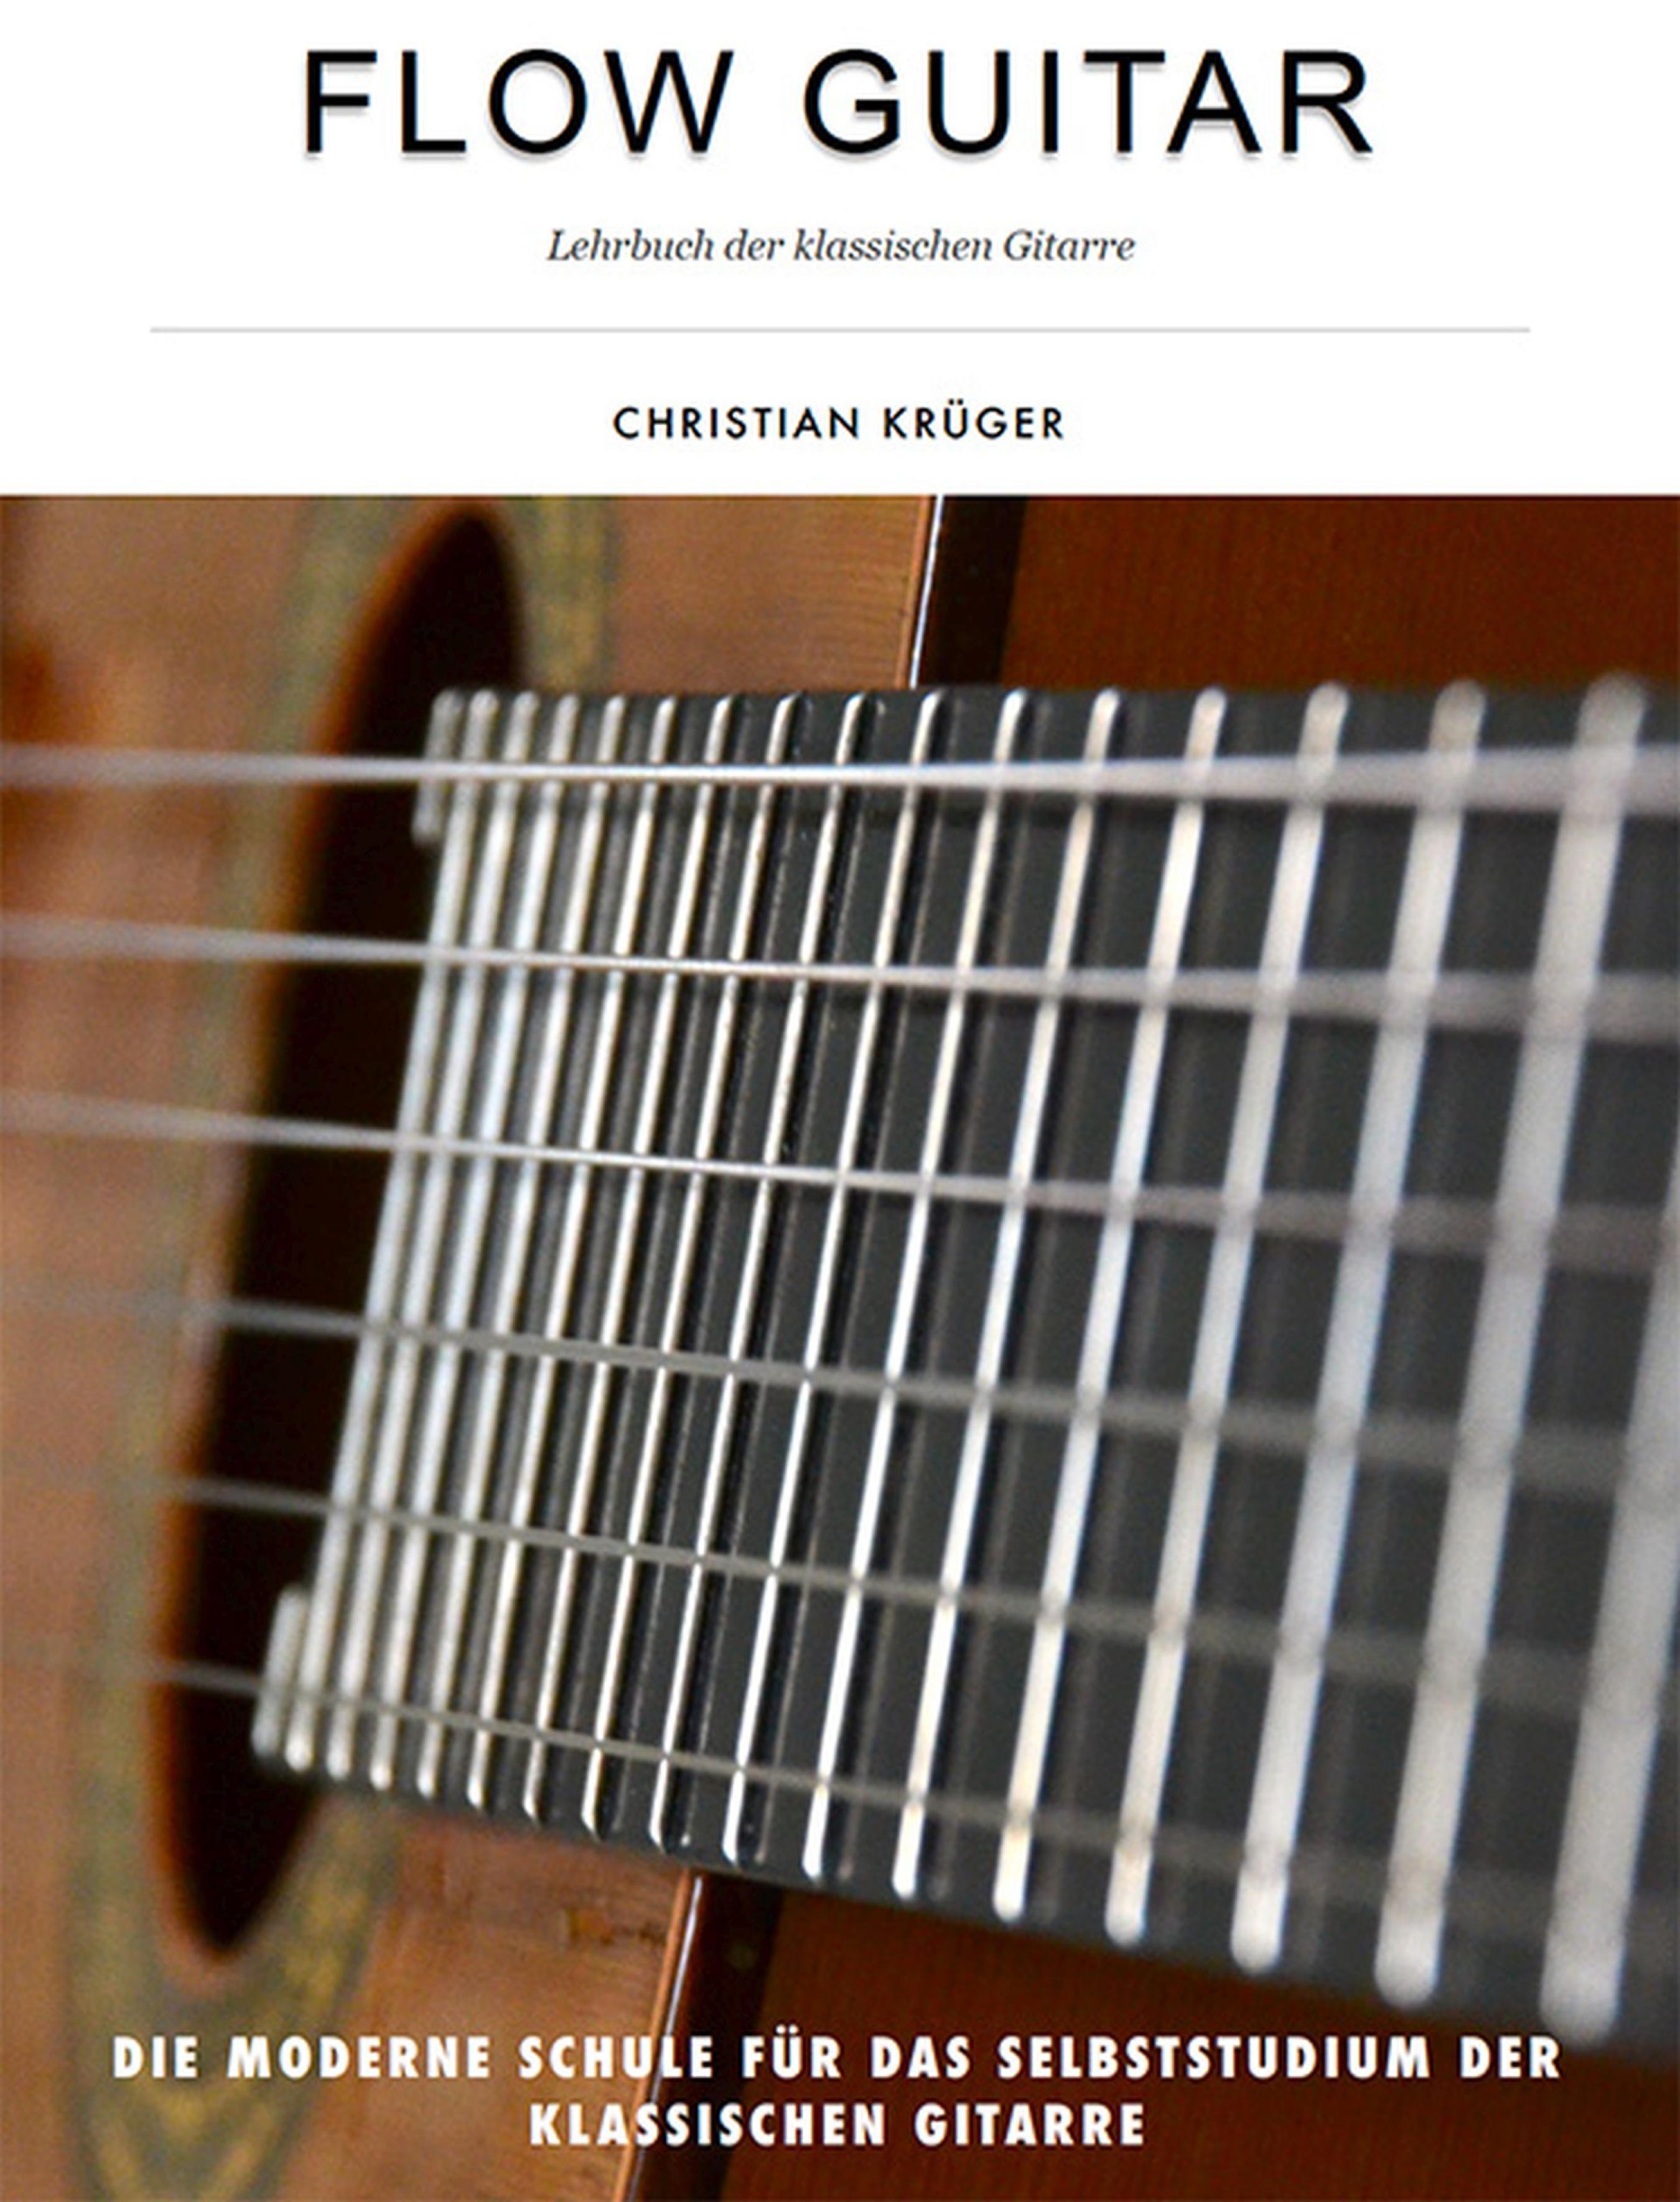 цена Christian Krüger Flow Guitar- Lehrbuch der klassischen Gitarre онлайн в 2017 году